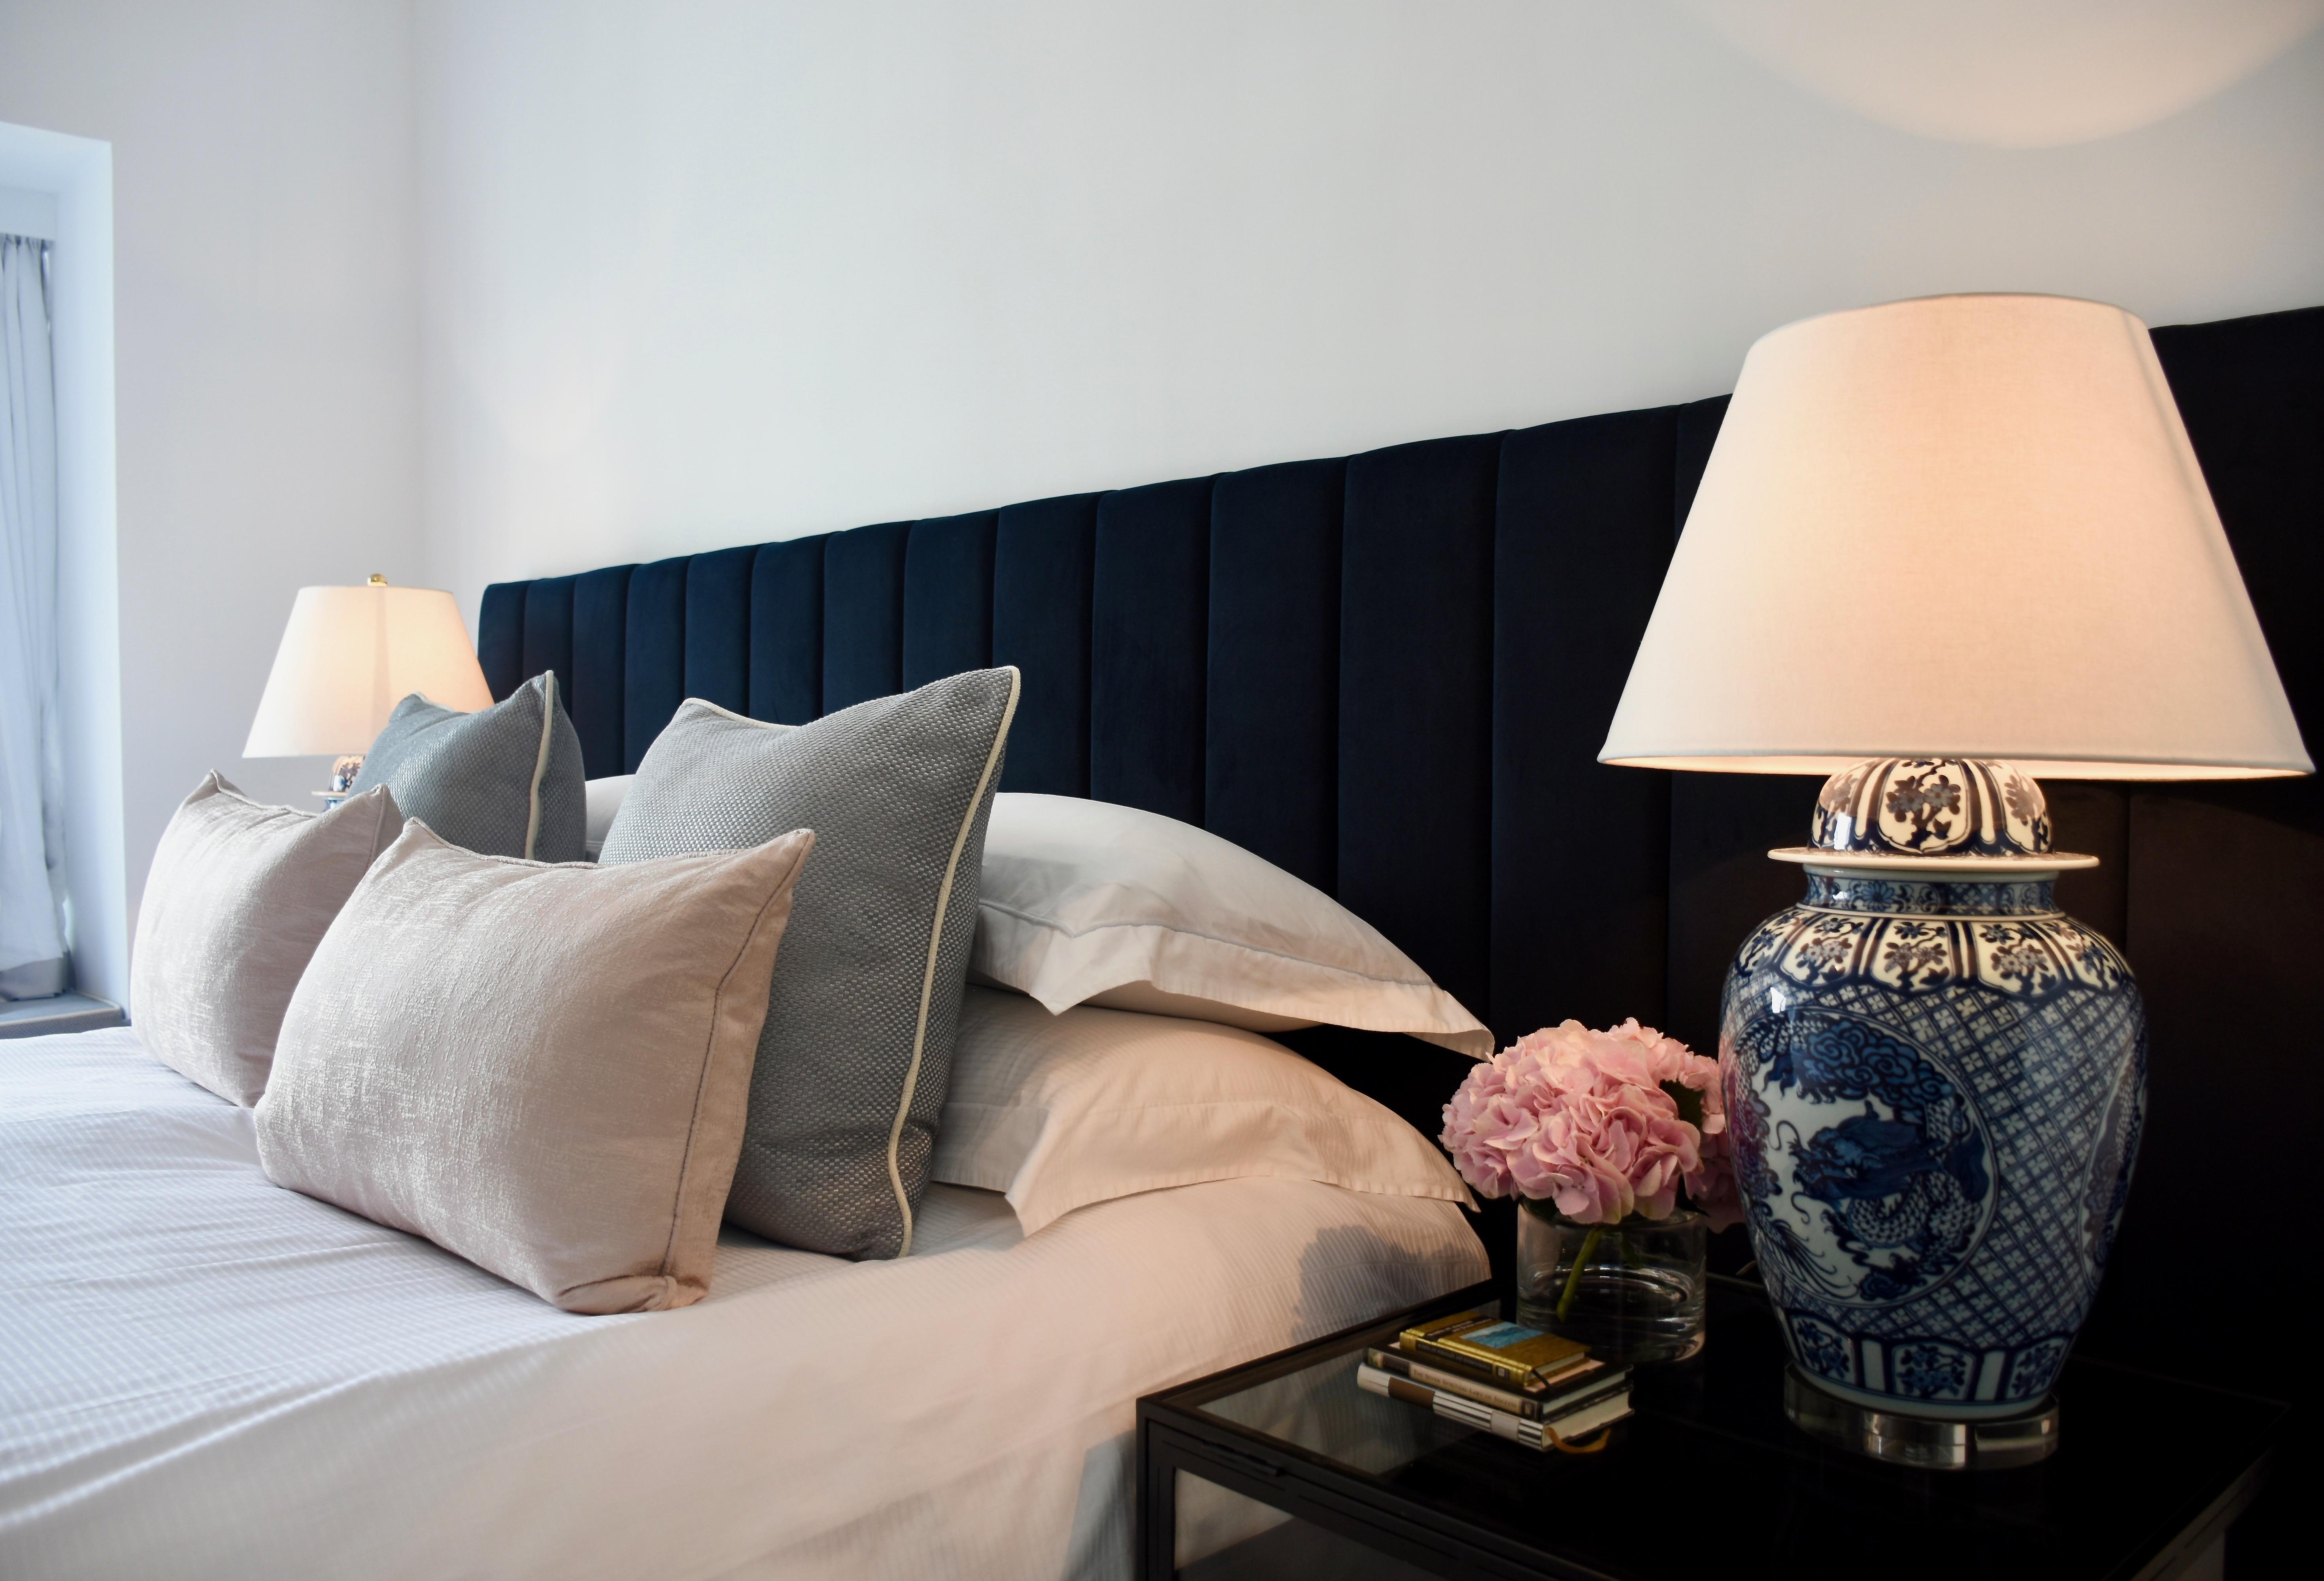 Branksome Bedroom bedhead